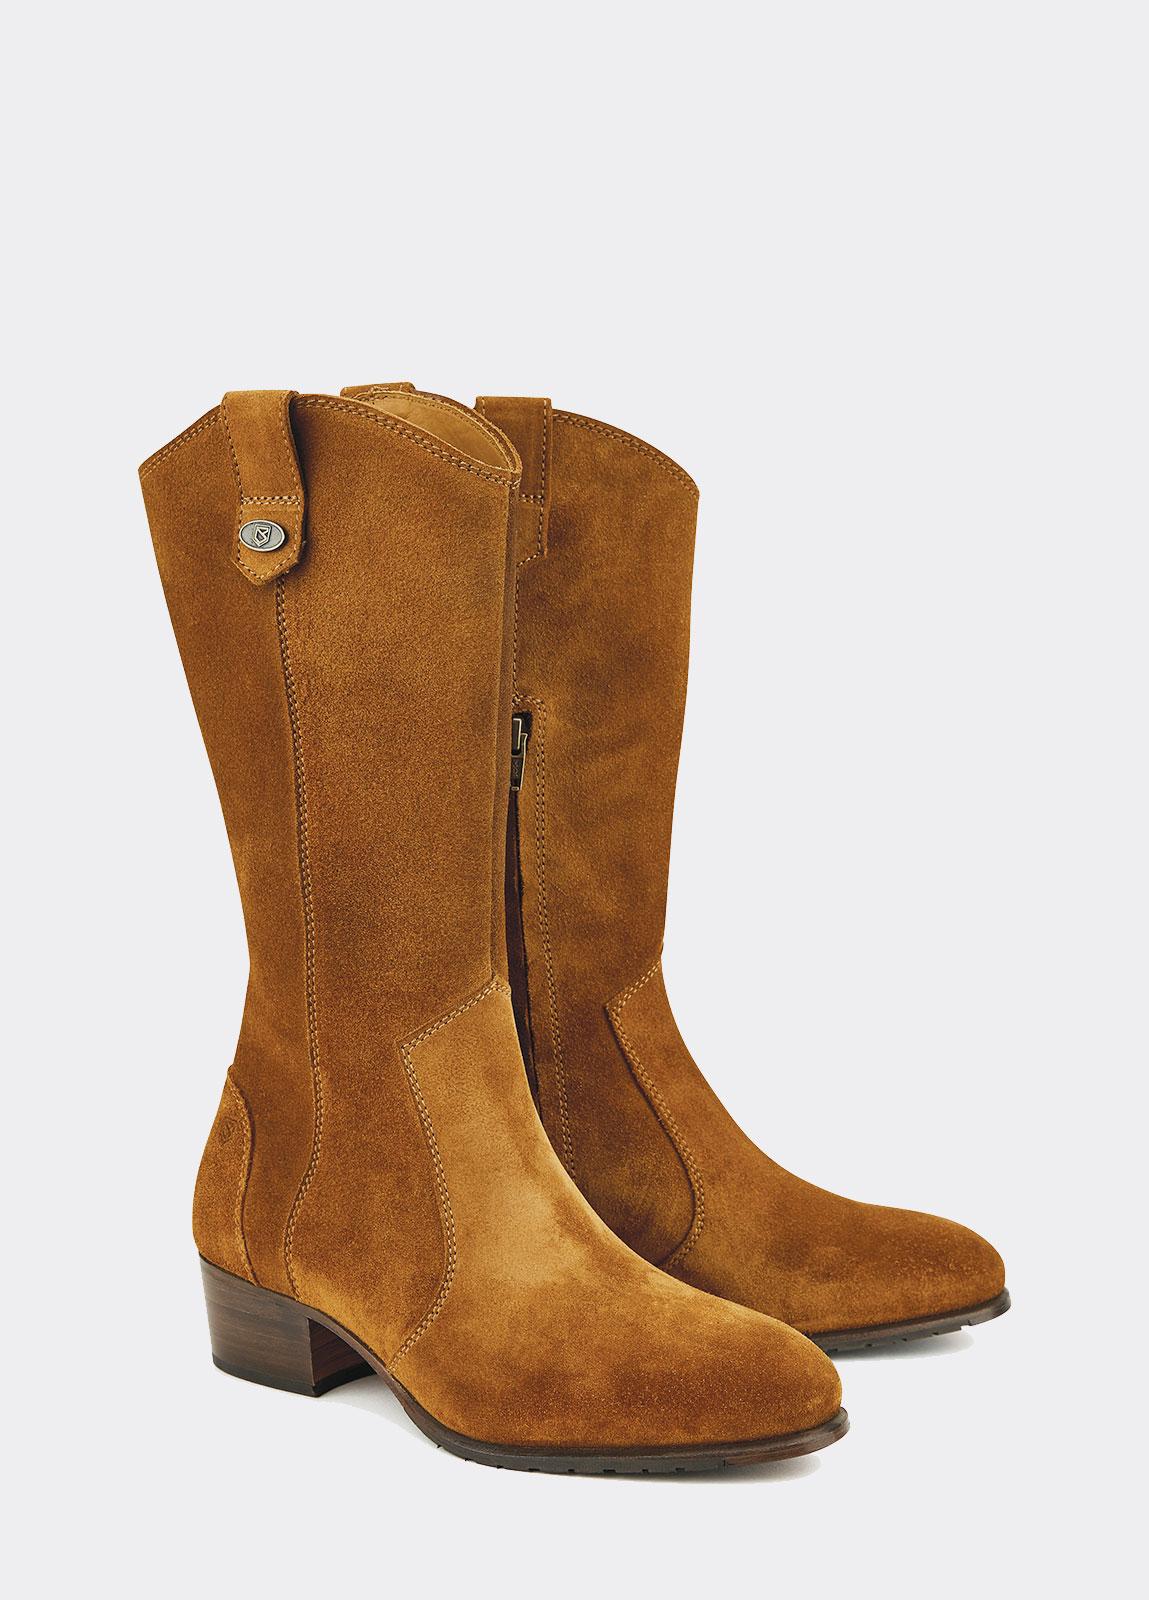 Portobello Leather Soled Boot - Camel